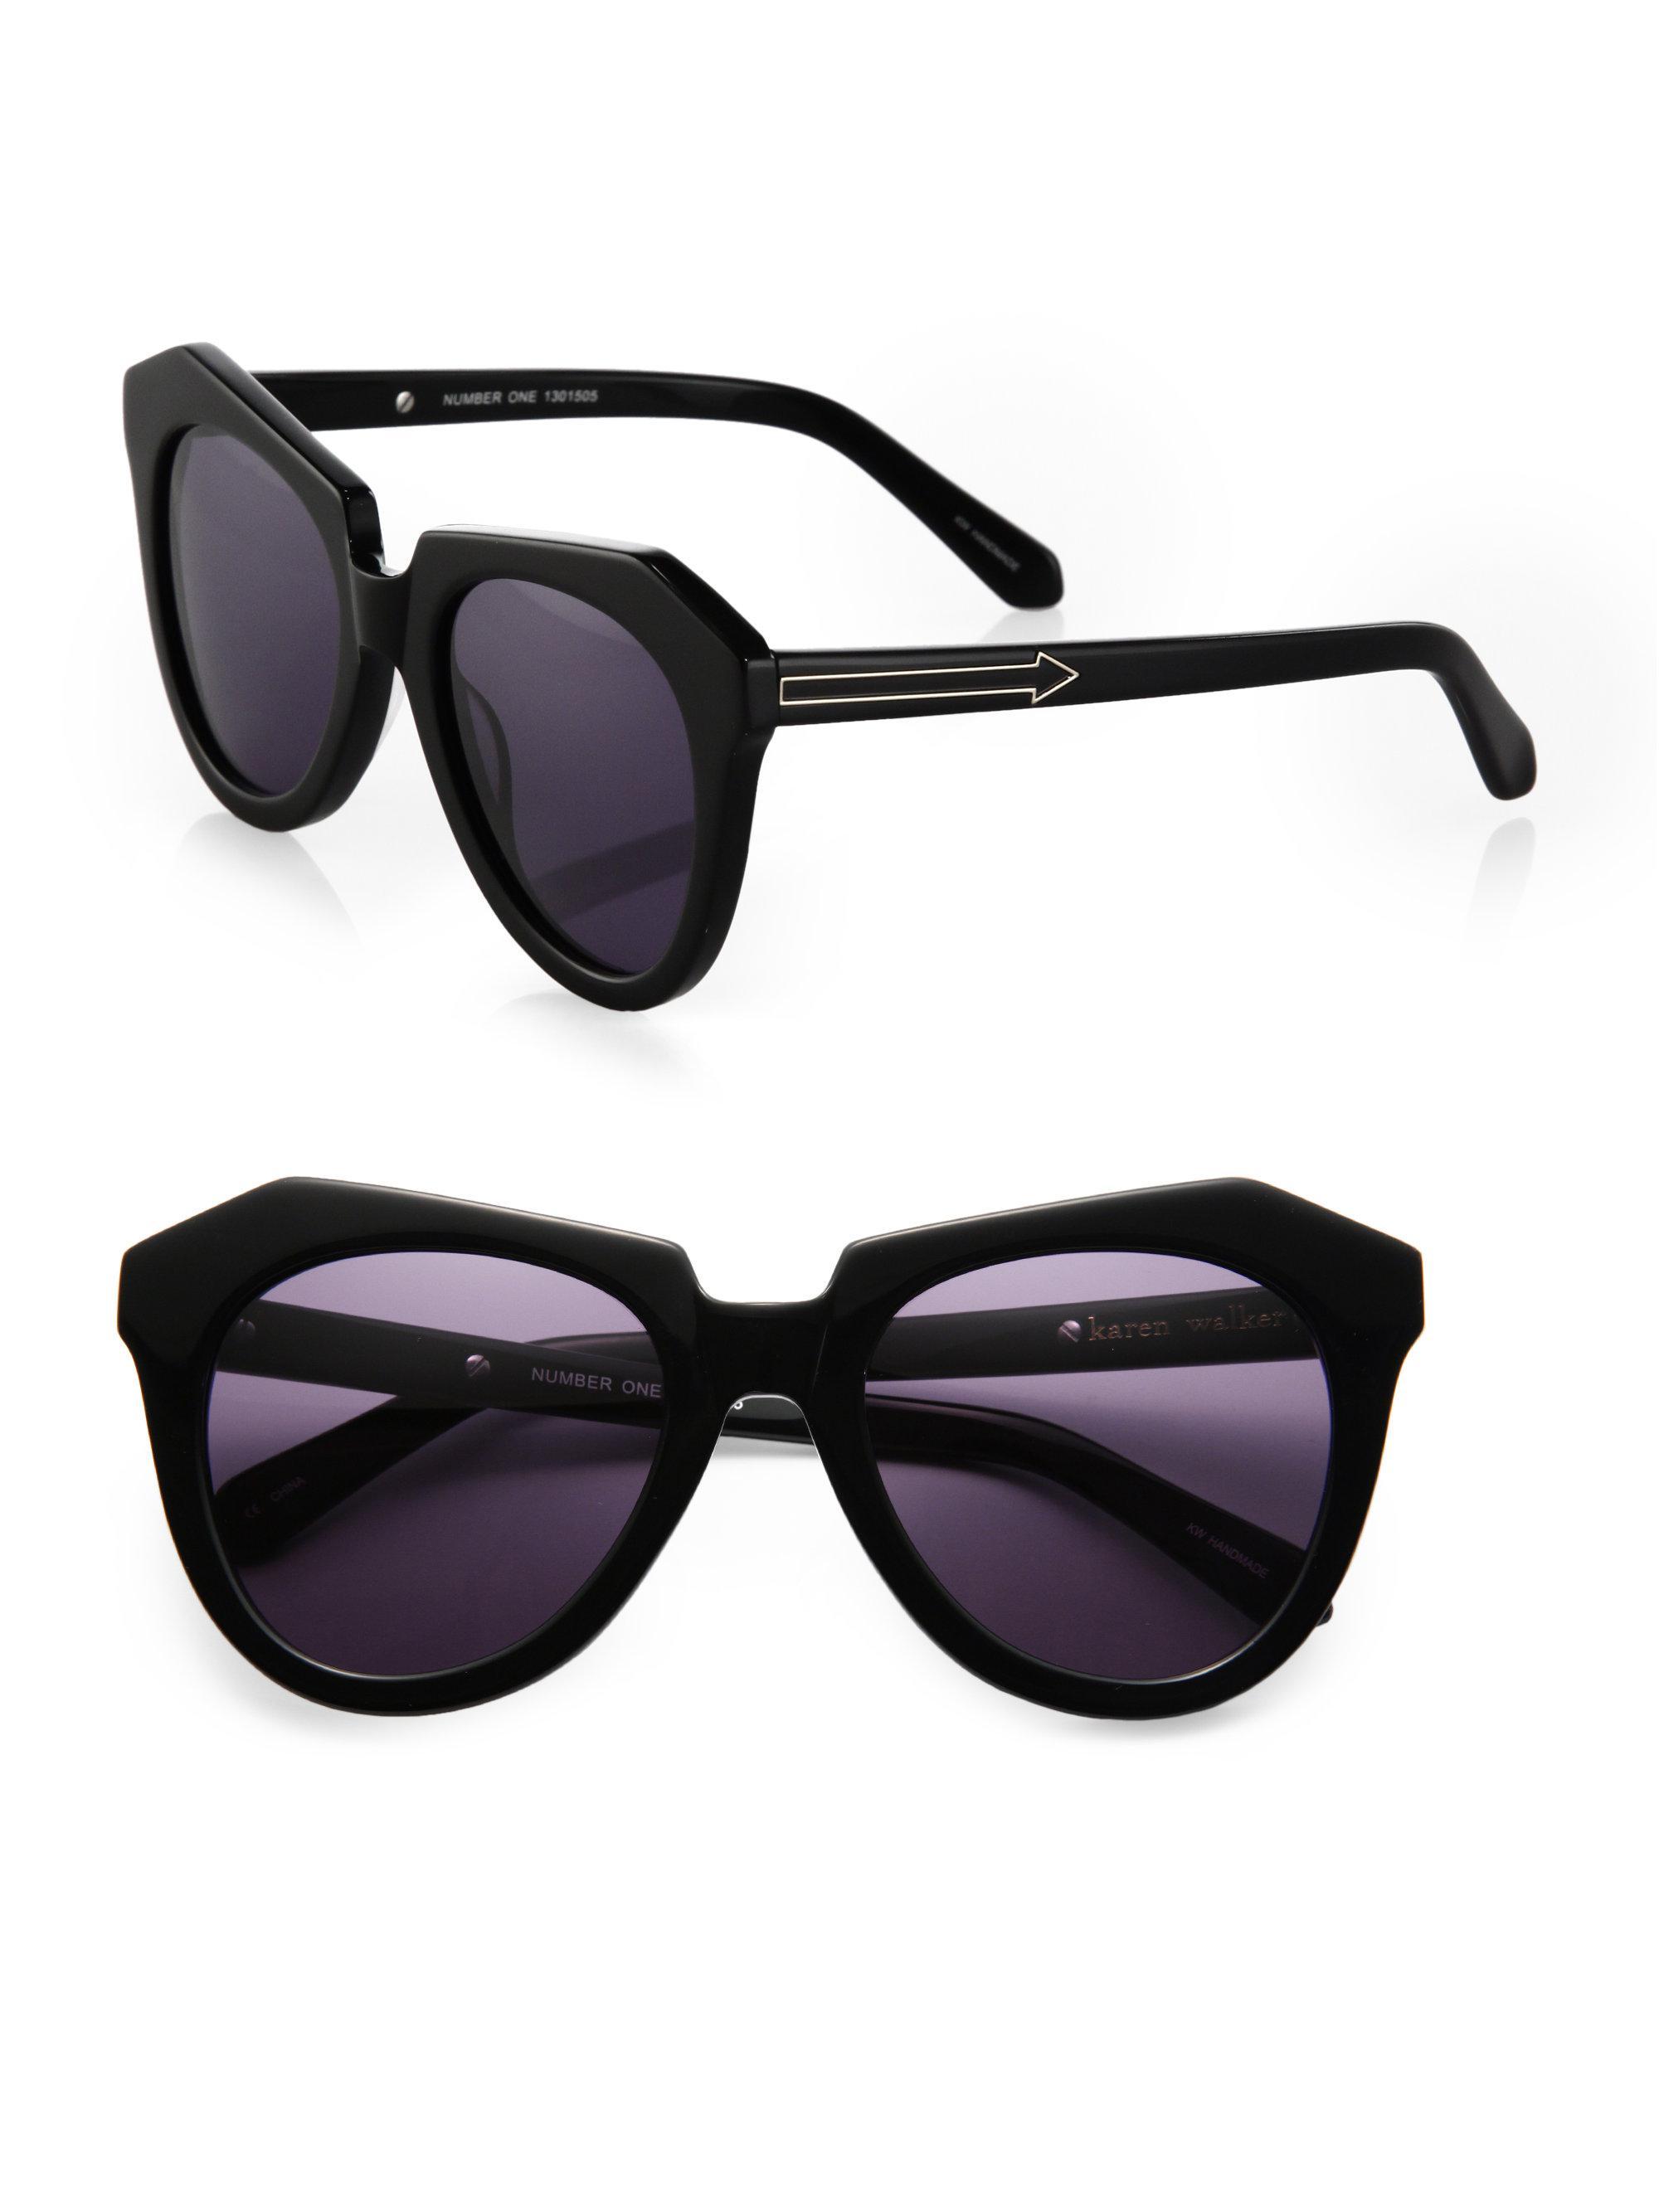 b361605b625 Lyst - Karen Walker Number One Plastic Sunglasses in Black